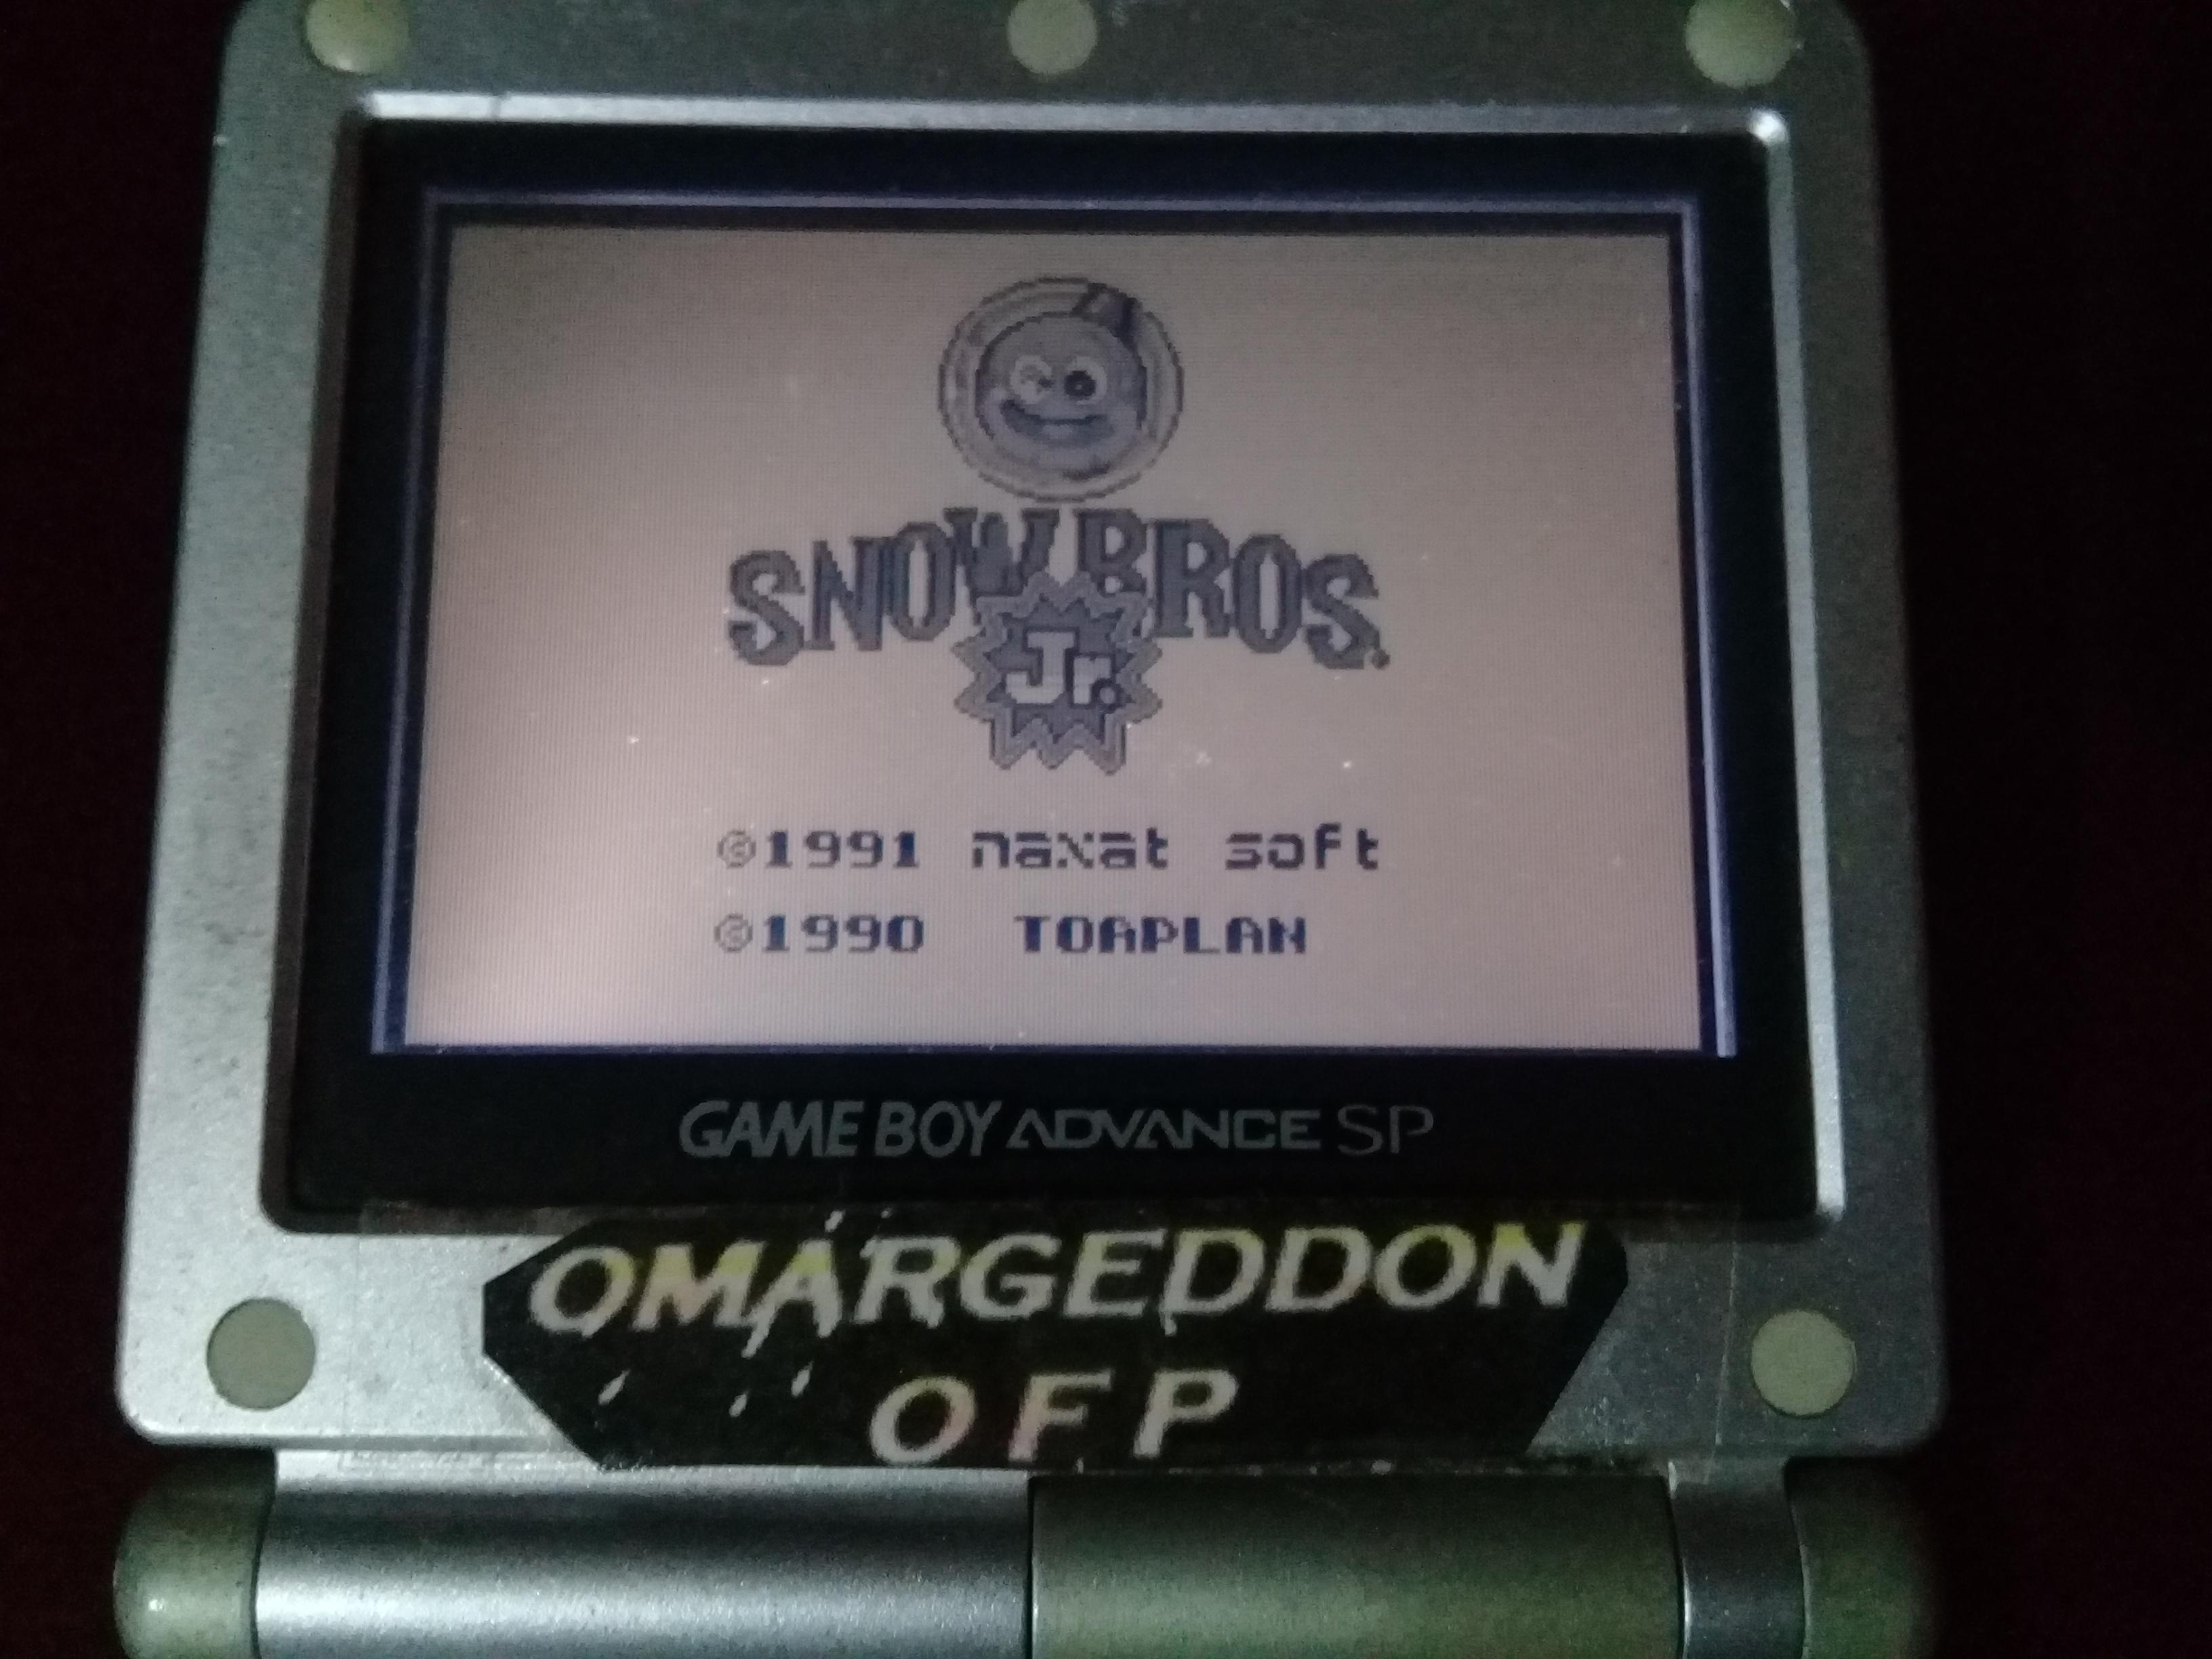 omargeddon: Snow Bros. Jr. (Game Boy) 6,330 points on 2019-08-25 14:09:19